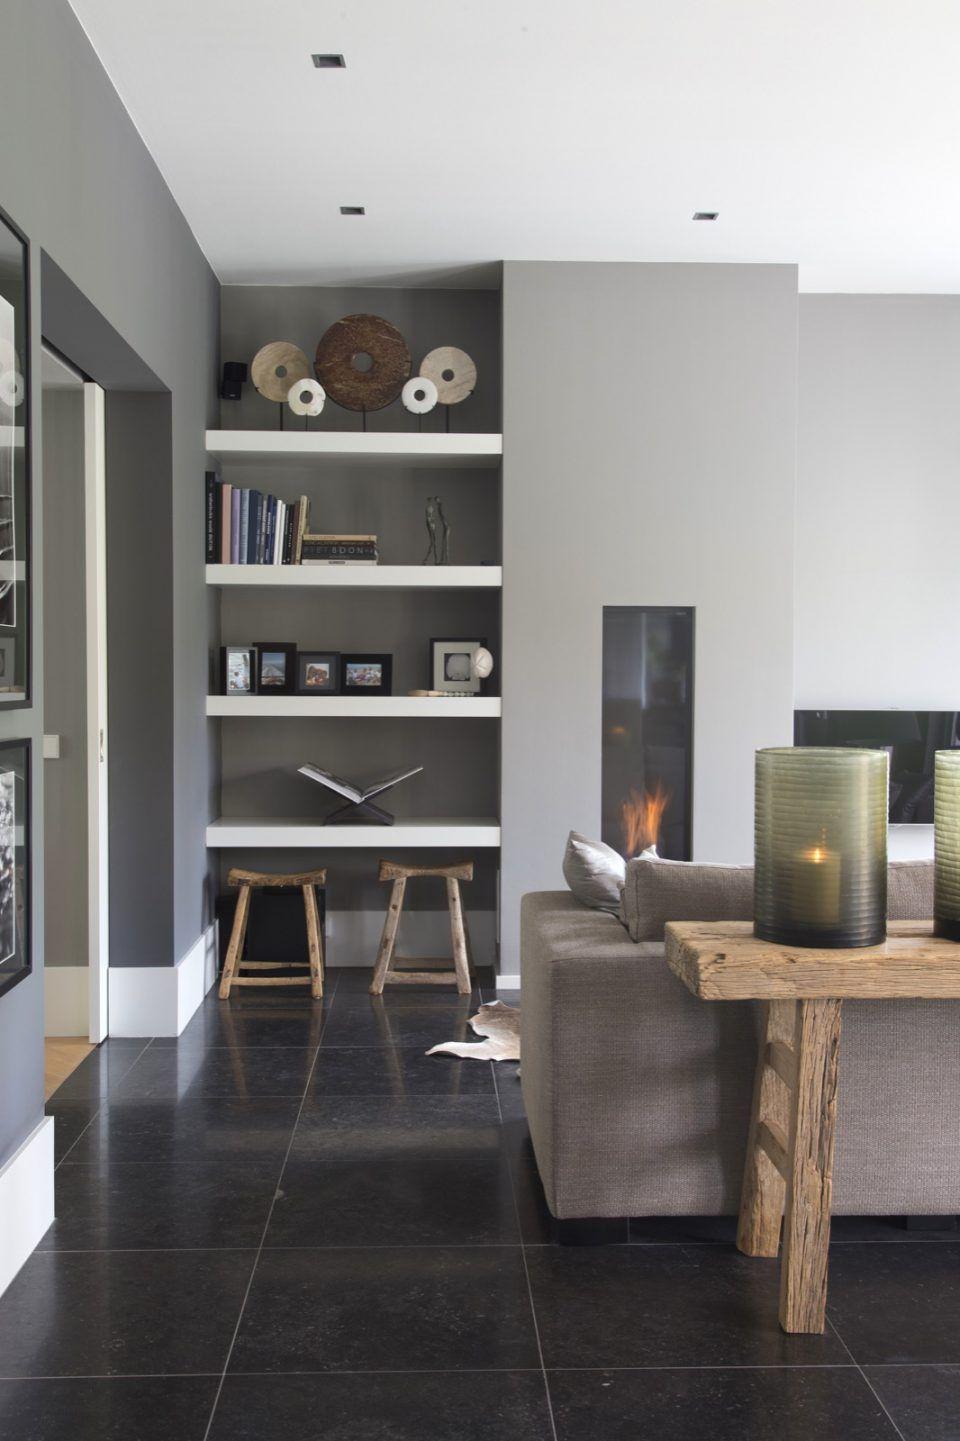 Luxe woonkamer ontwerp met design meubels - A cosy place ...